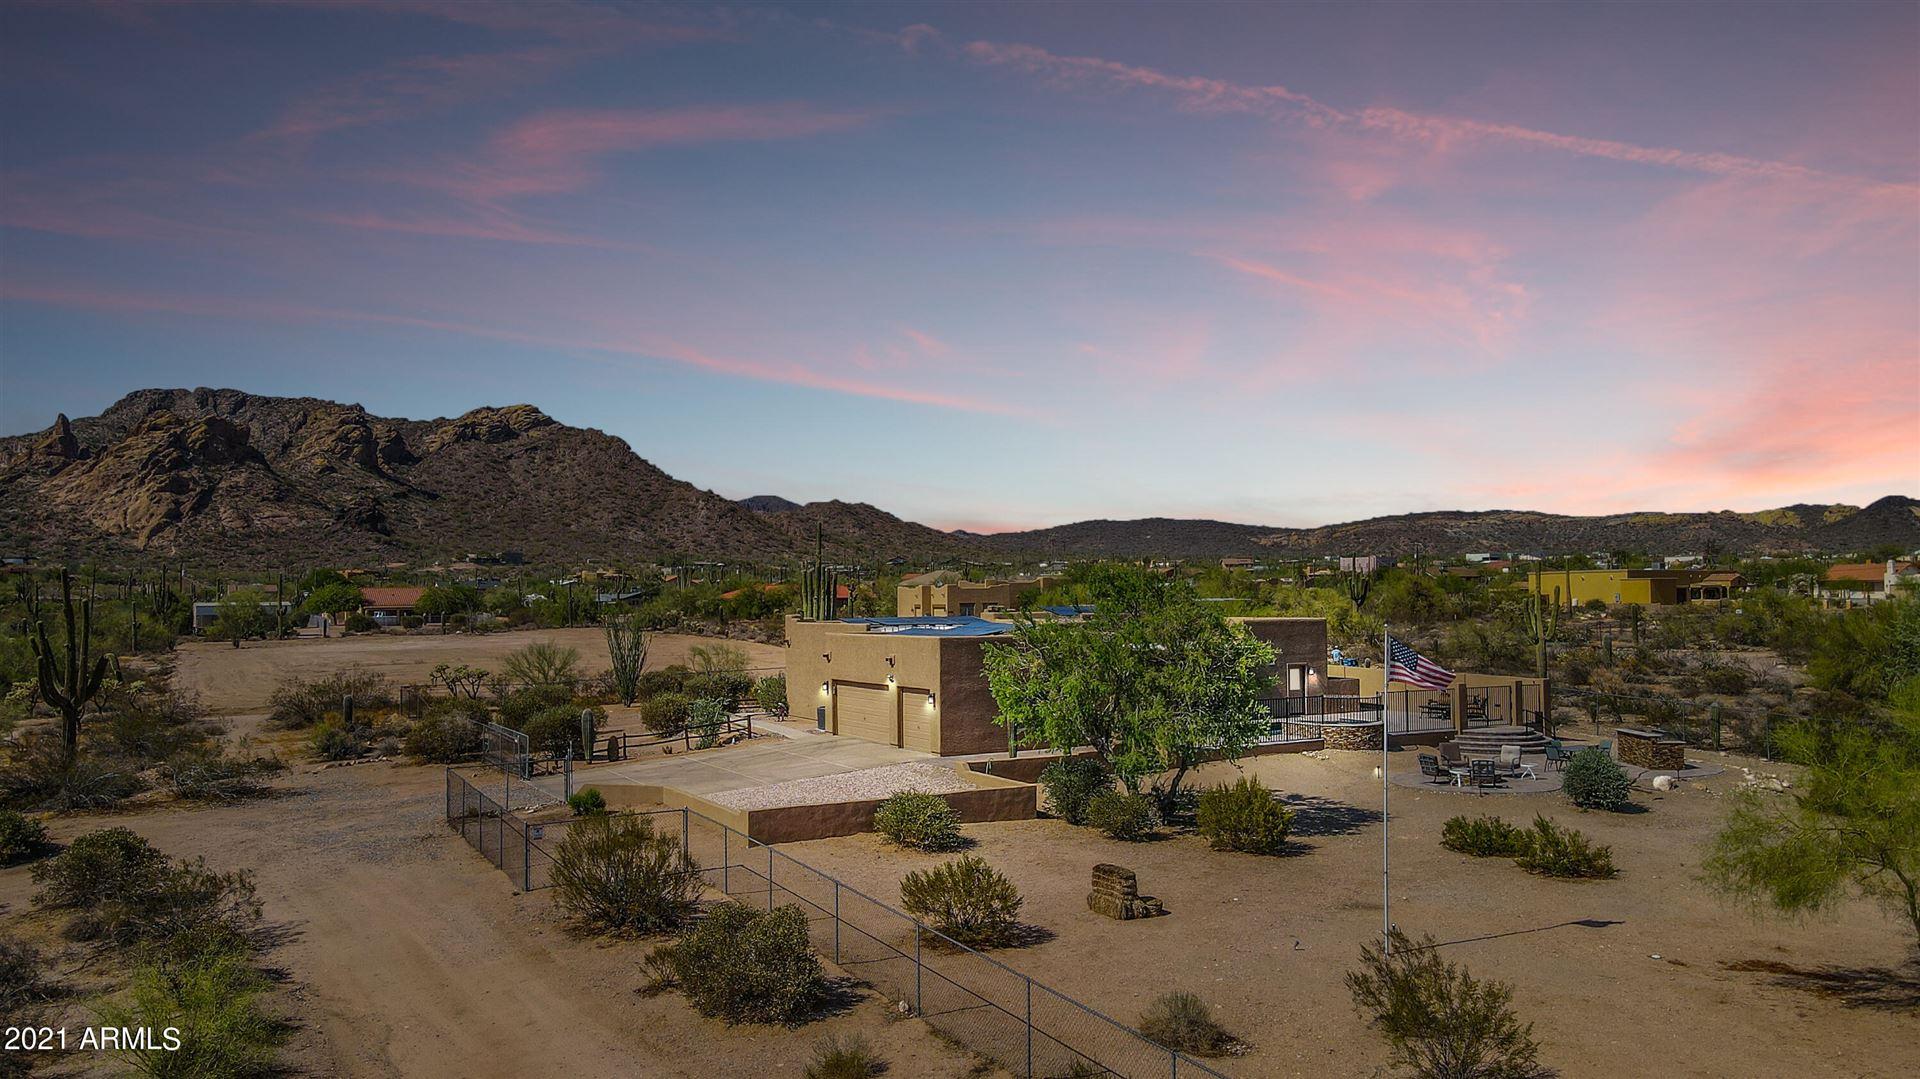 Photo of 223 E CANYON Street, Apache Junction, AZ 85119 (MLS # 6263604)